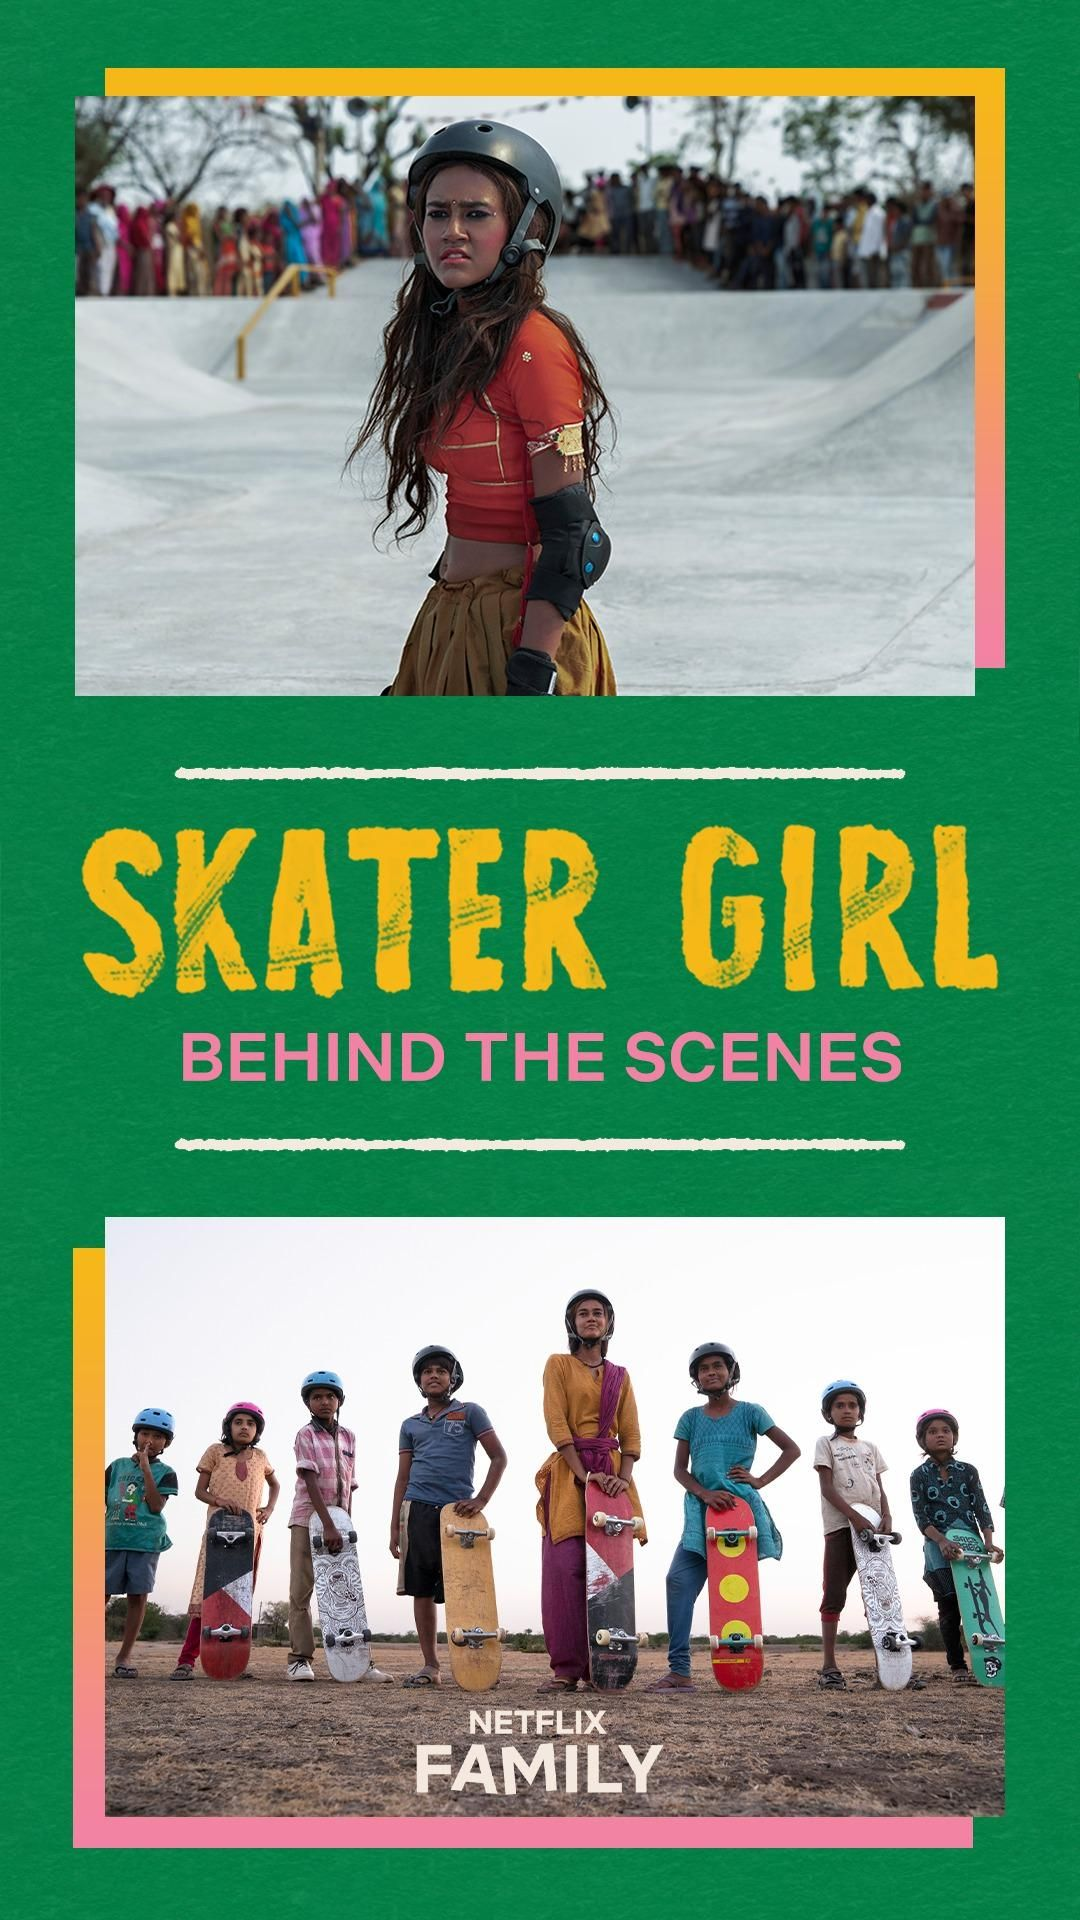 SKATER GIRL | Behind the Scenes